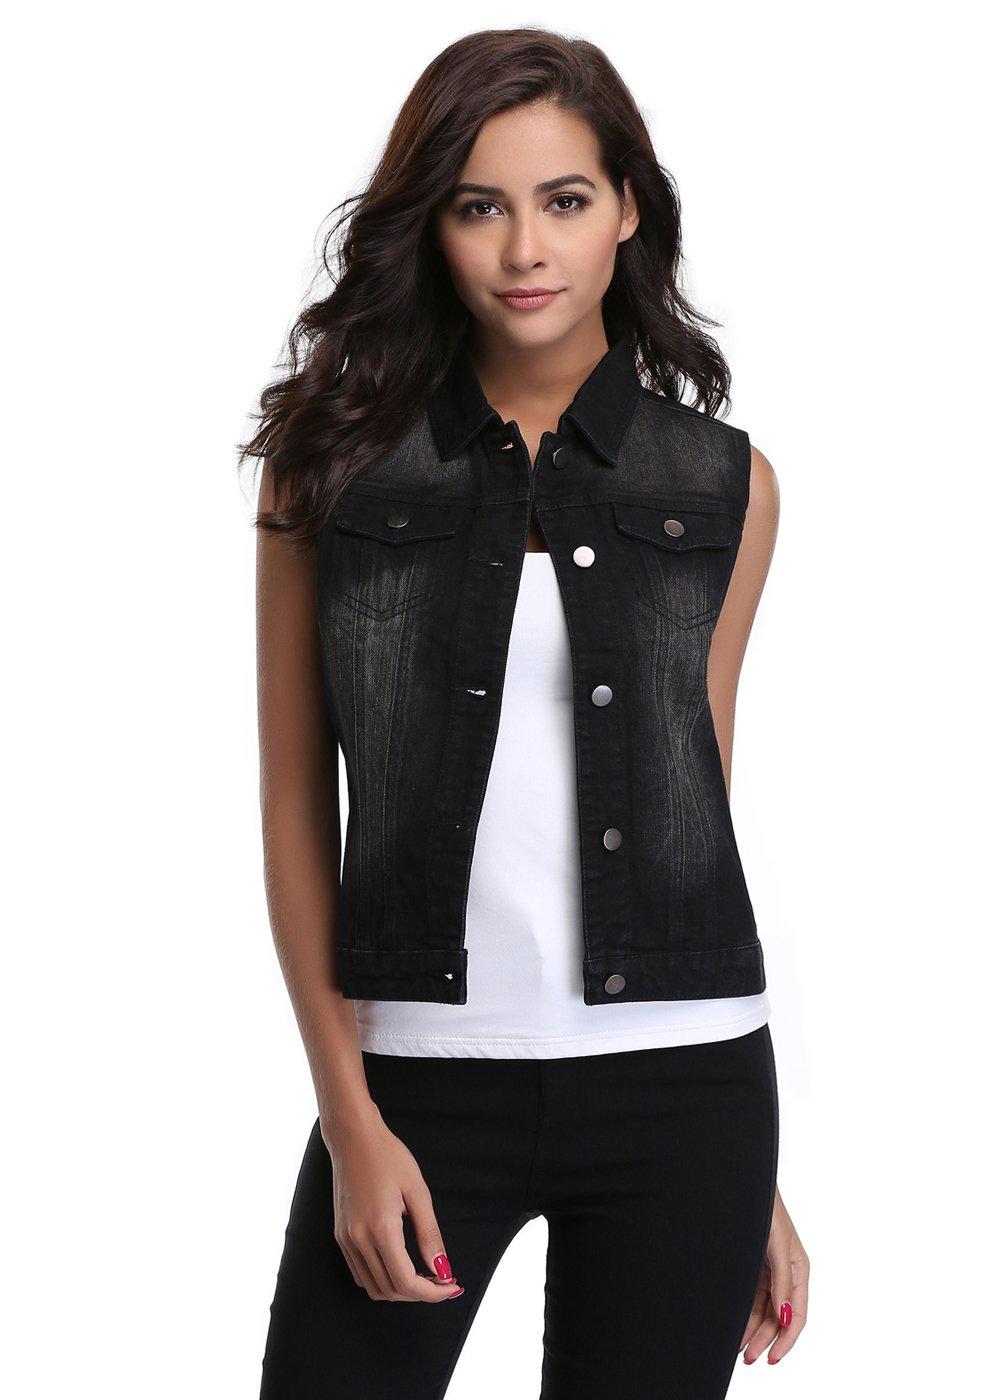 MISS MOLY Women's Buttoned Washed Denim Vest With Western Pockets Black Vest L